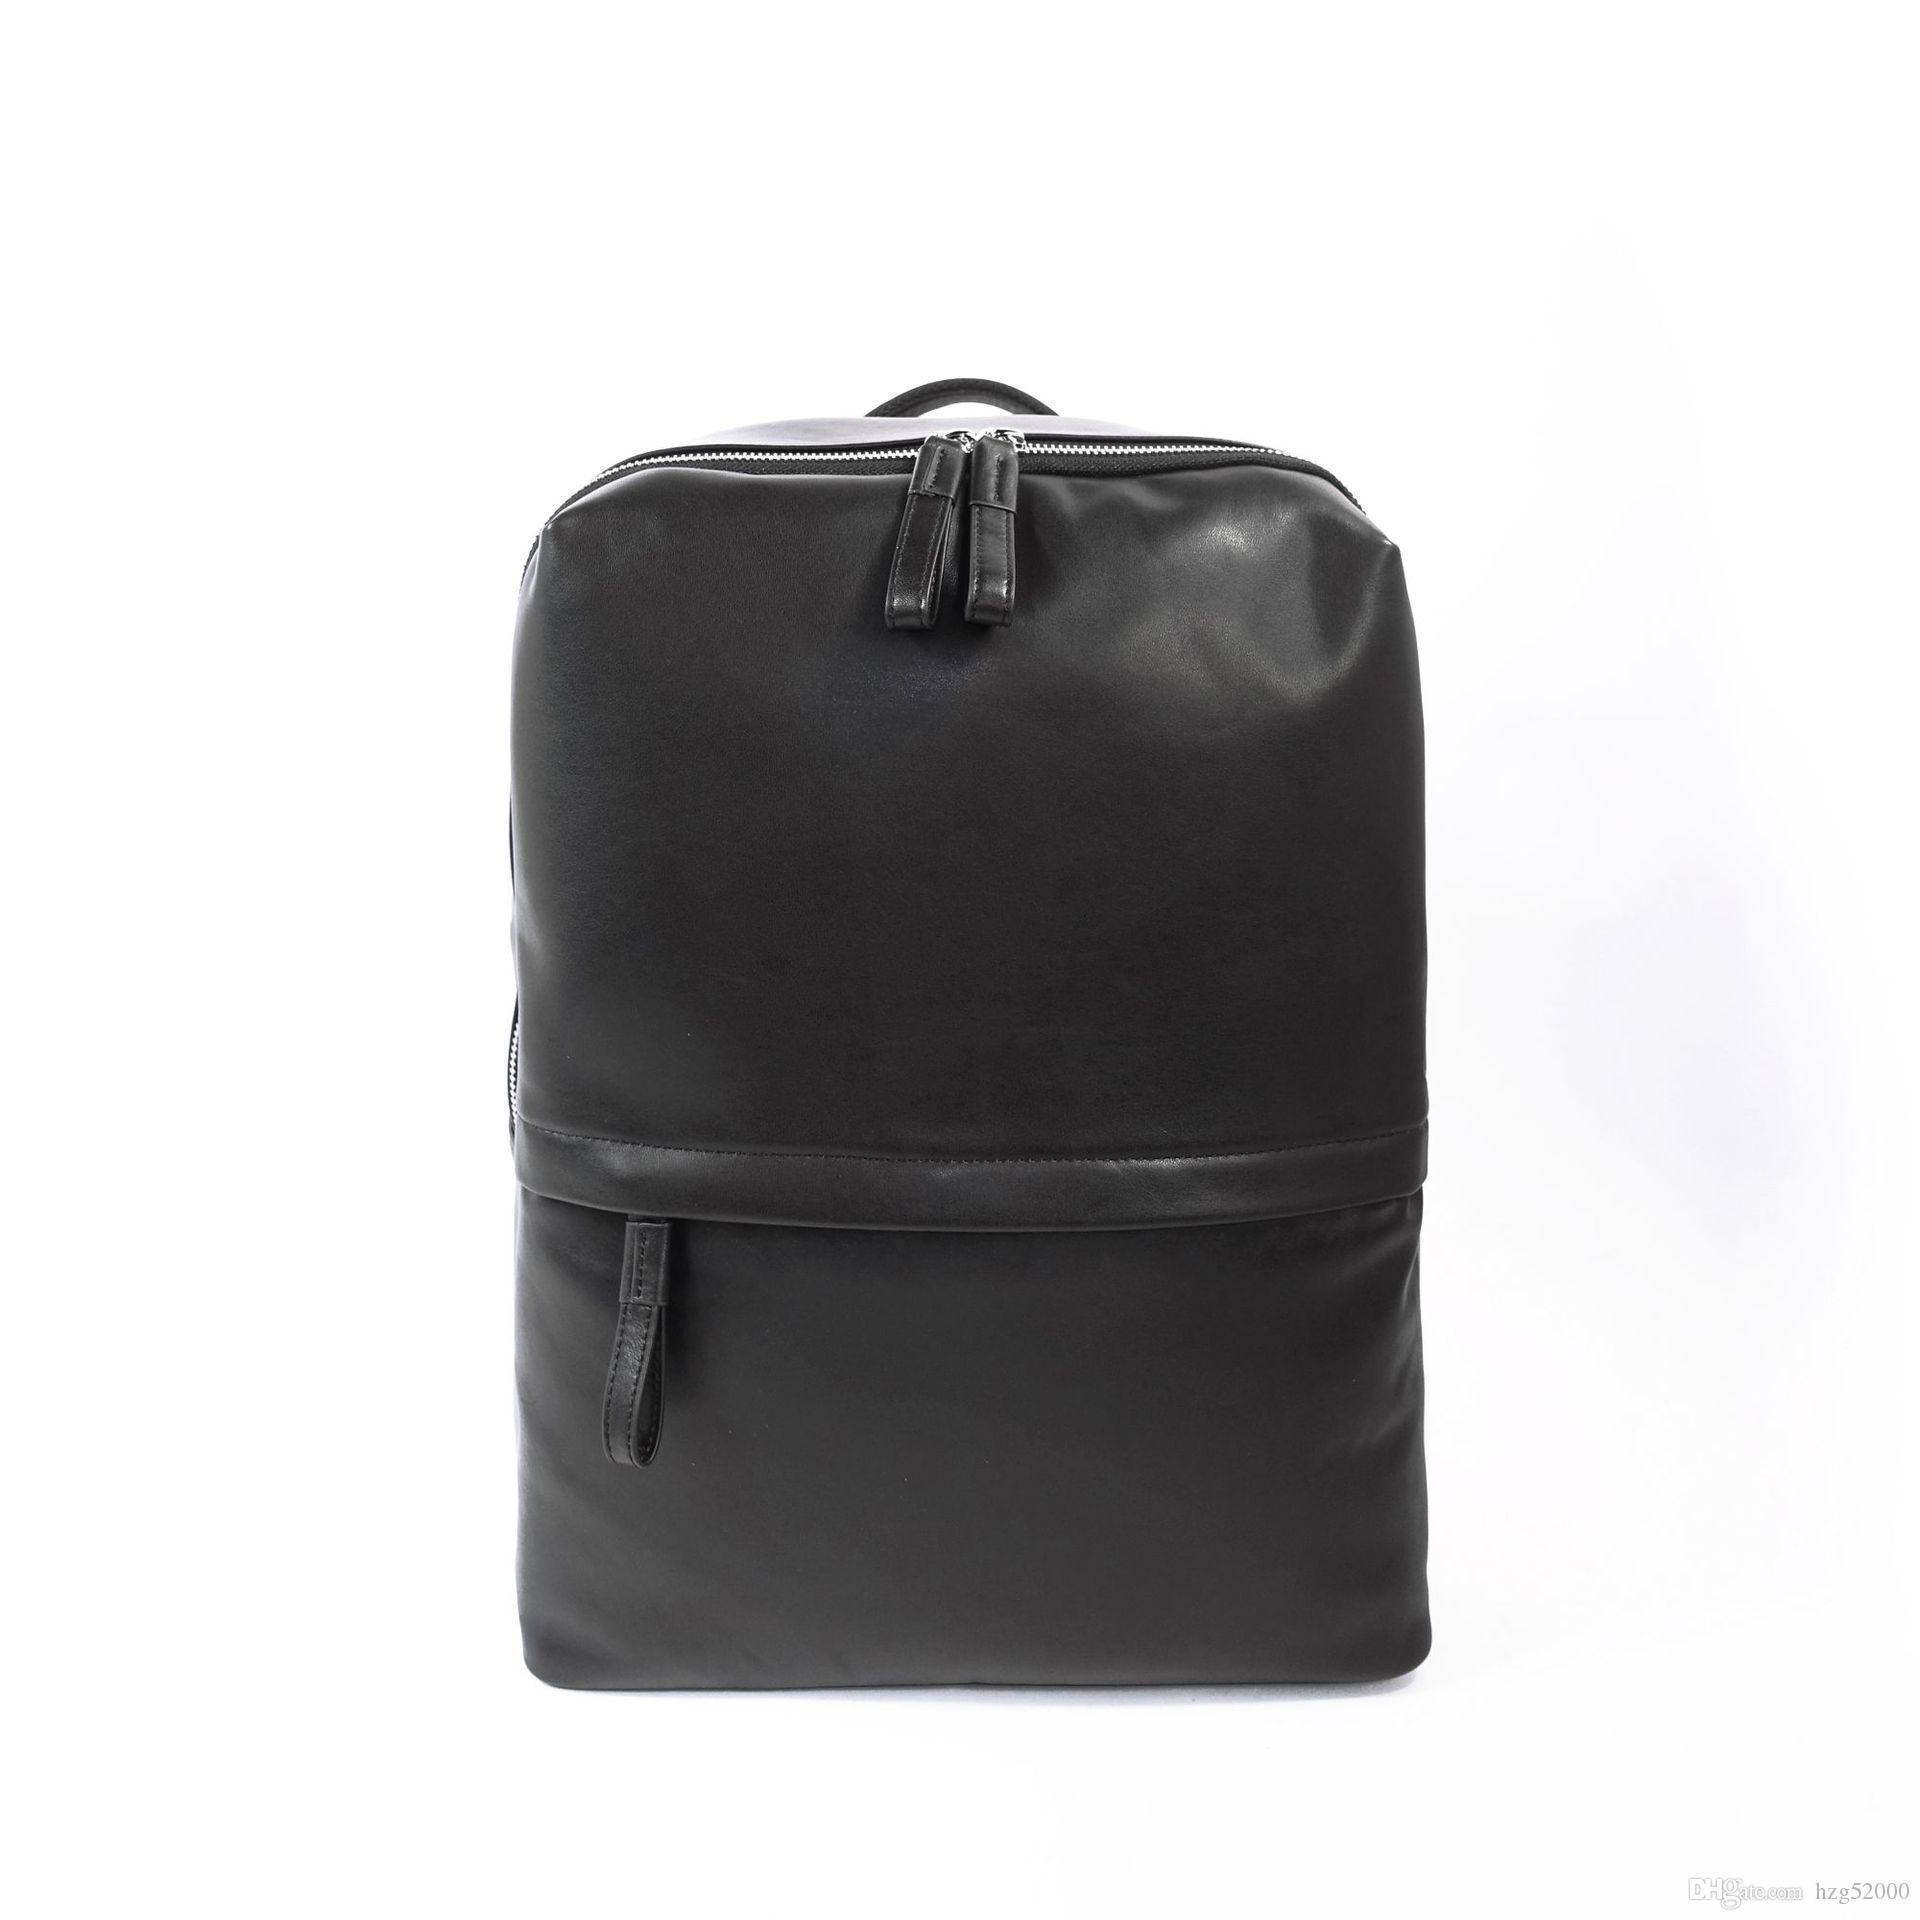 valise carry onTravel Sac Carry-OnVDesigner luxe Sacs à main Sacs à main en cuir Sac à bandoulière grand sac à dos